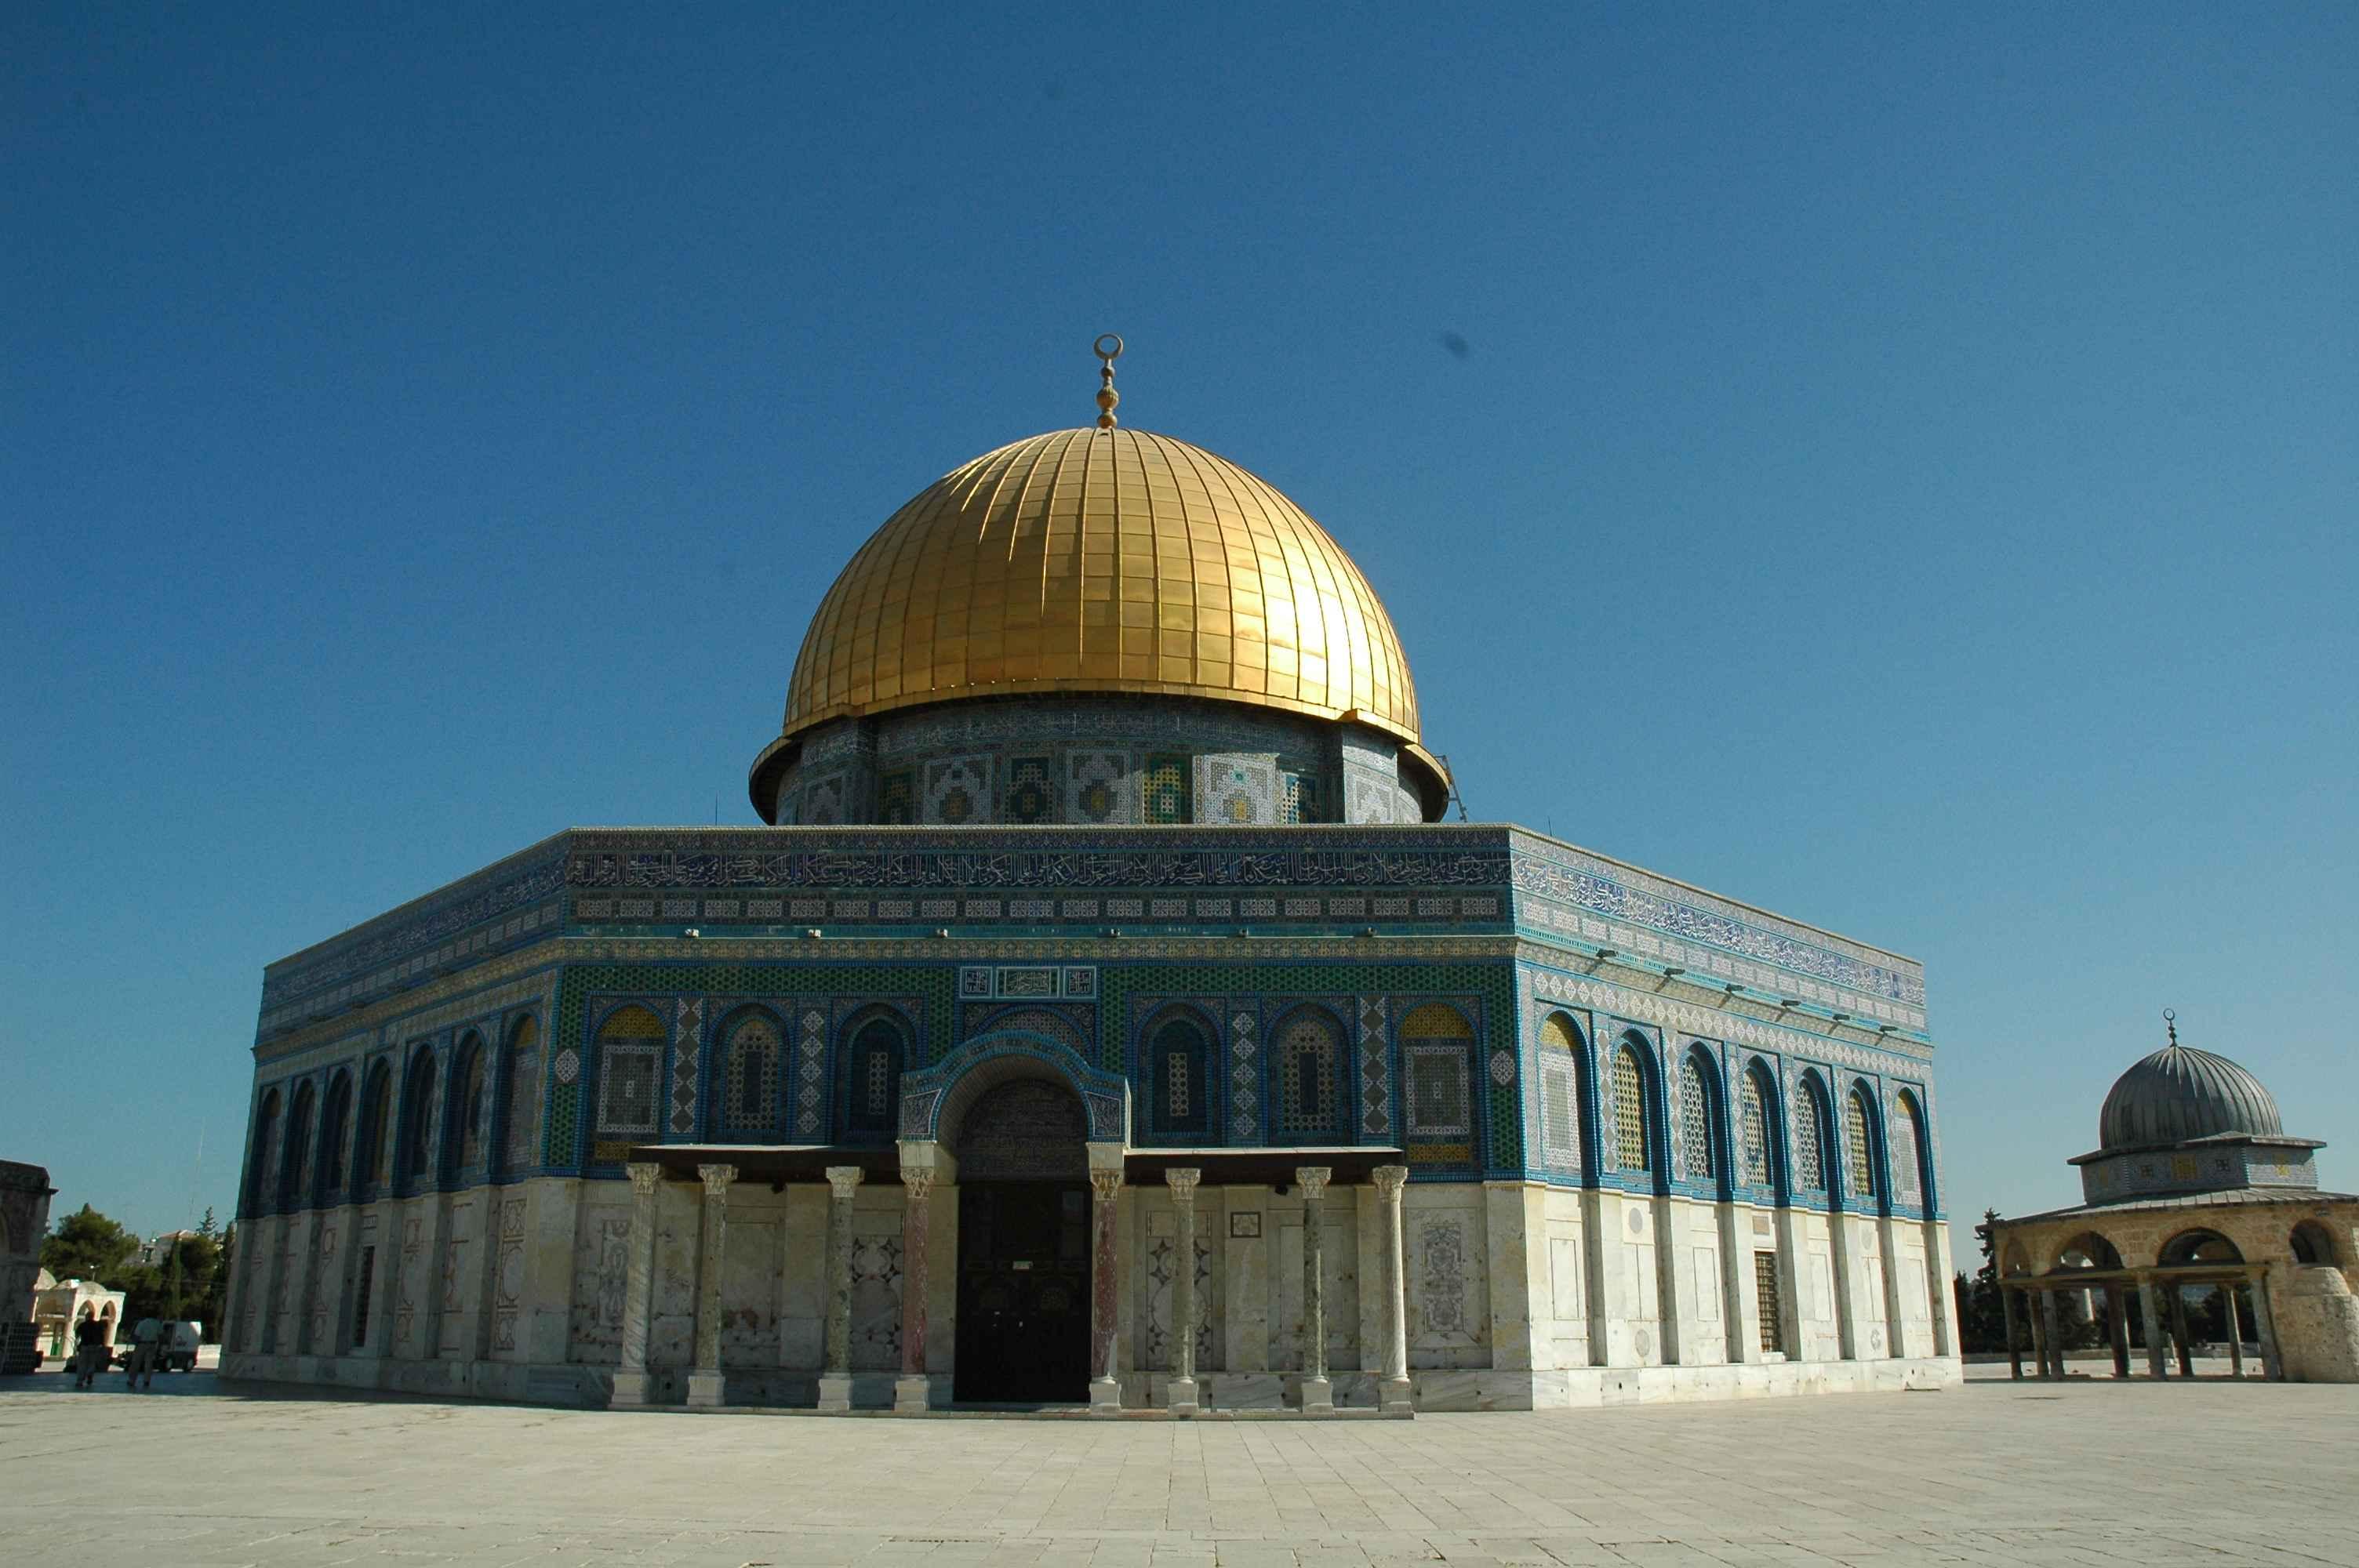 45 dome of the rock wallpaper on wallpapersafari - Al aqsa mosque hd wallpapers ...